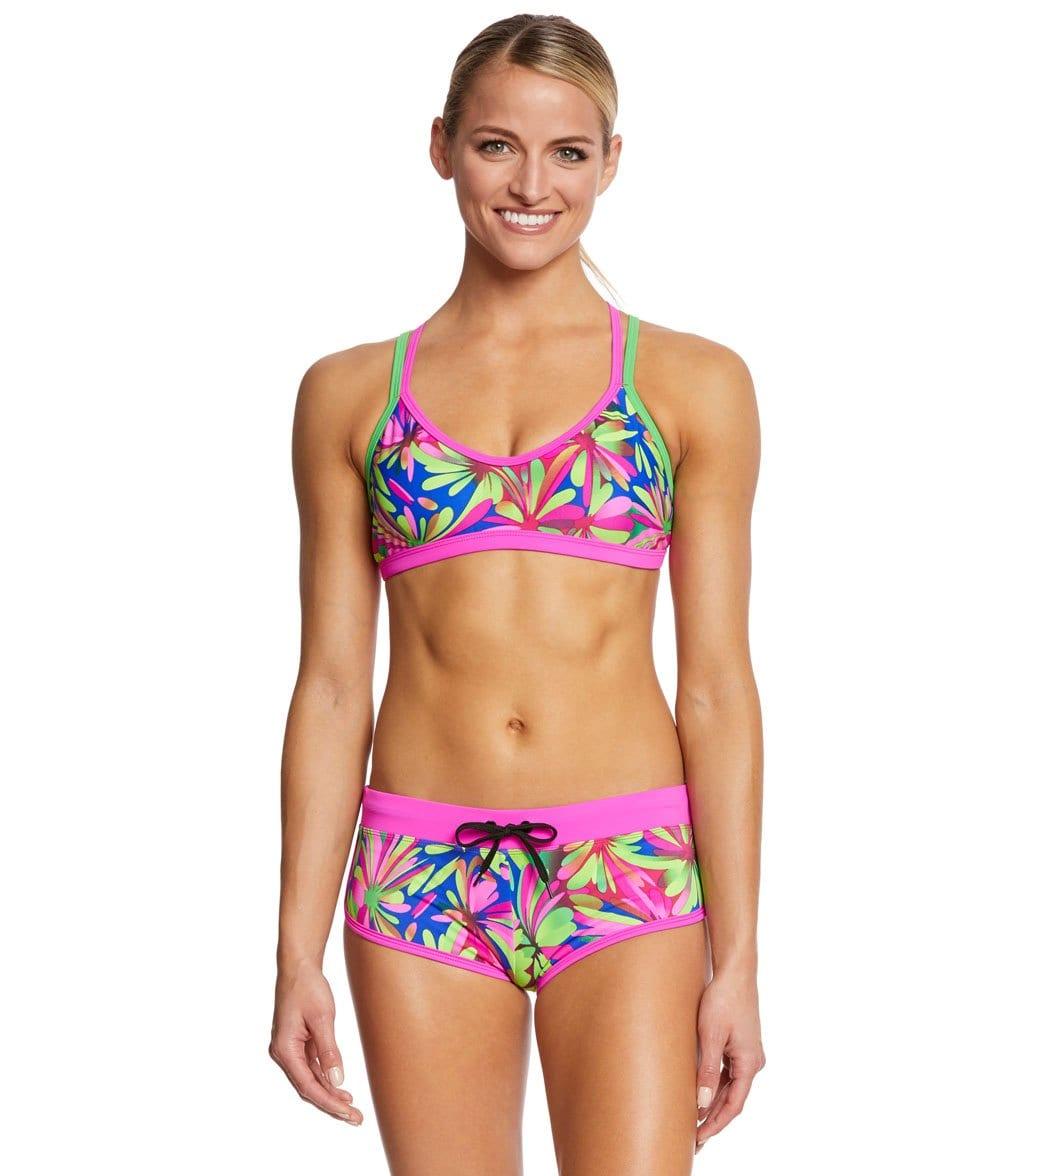 659a197e4bc Waterpro Women's Pom Poms Double Strap Bikini Set at SwimOutlet.com